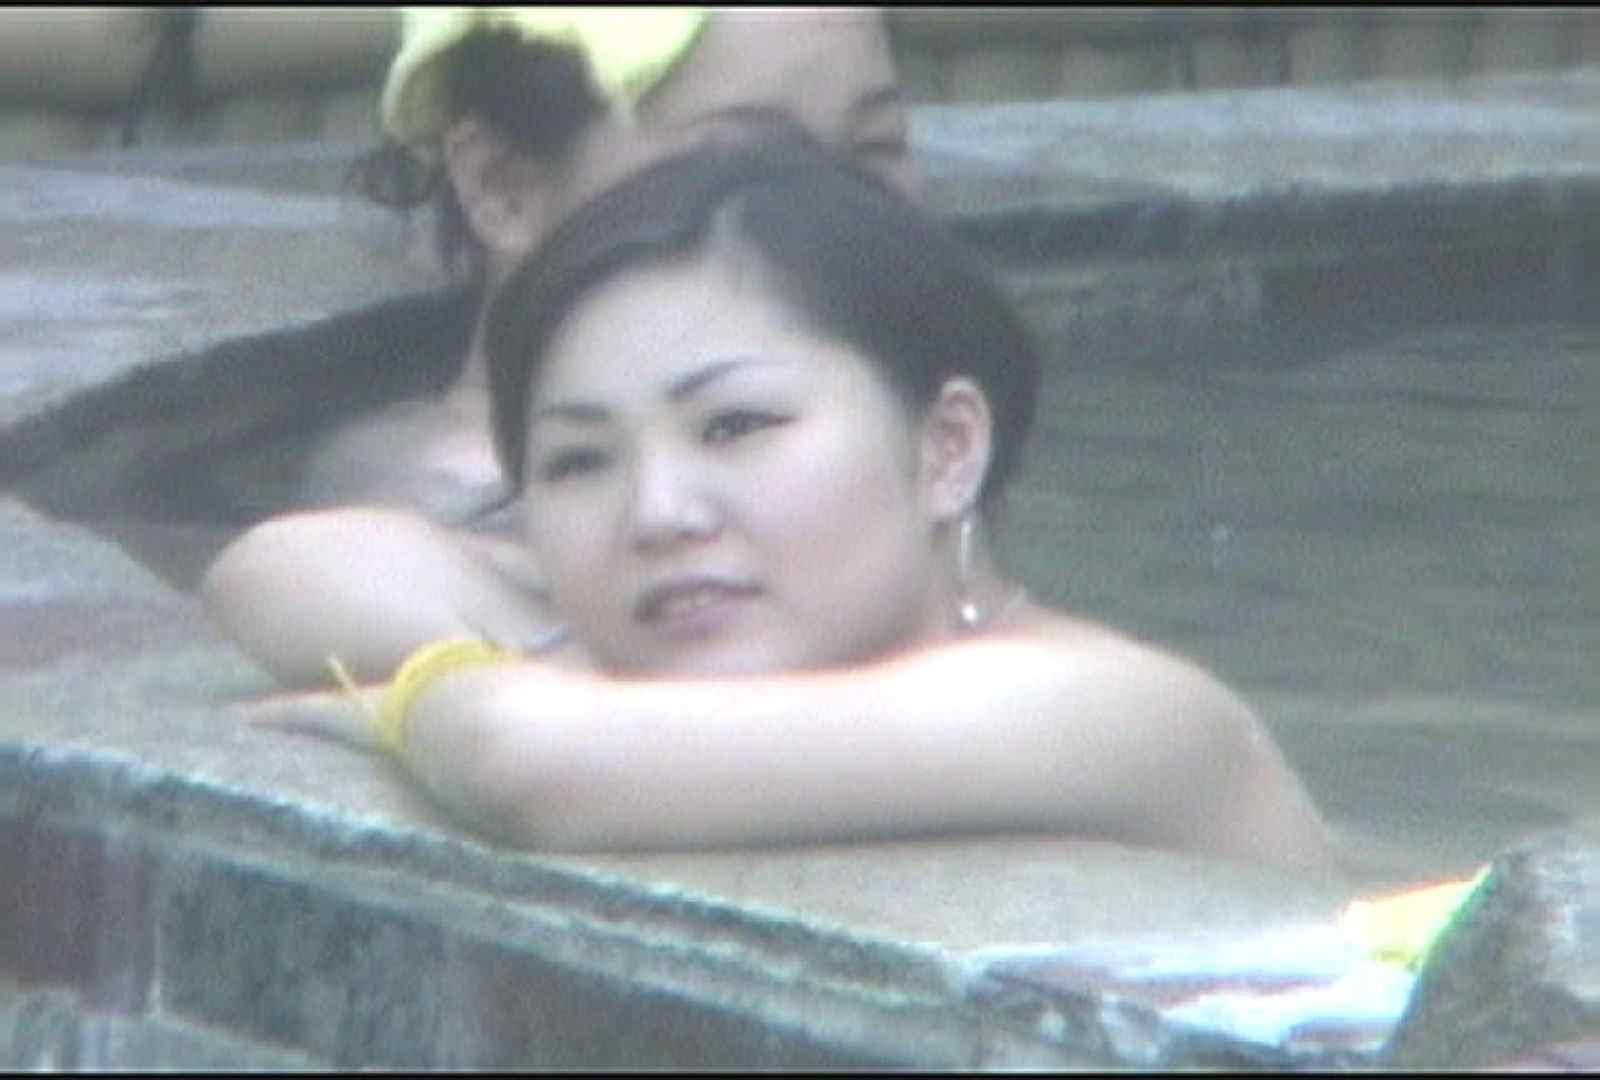 Aquaな露天風呂Vol.145 盗撮映像  78Pix 24